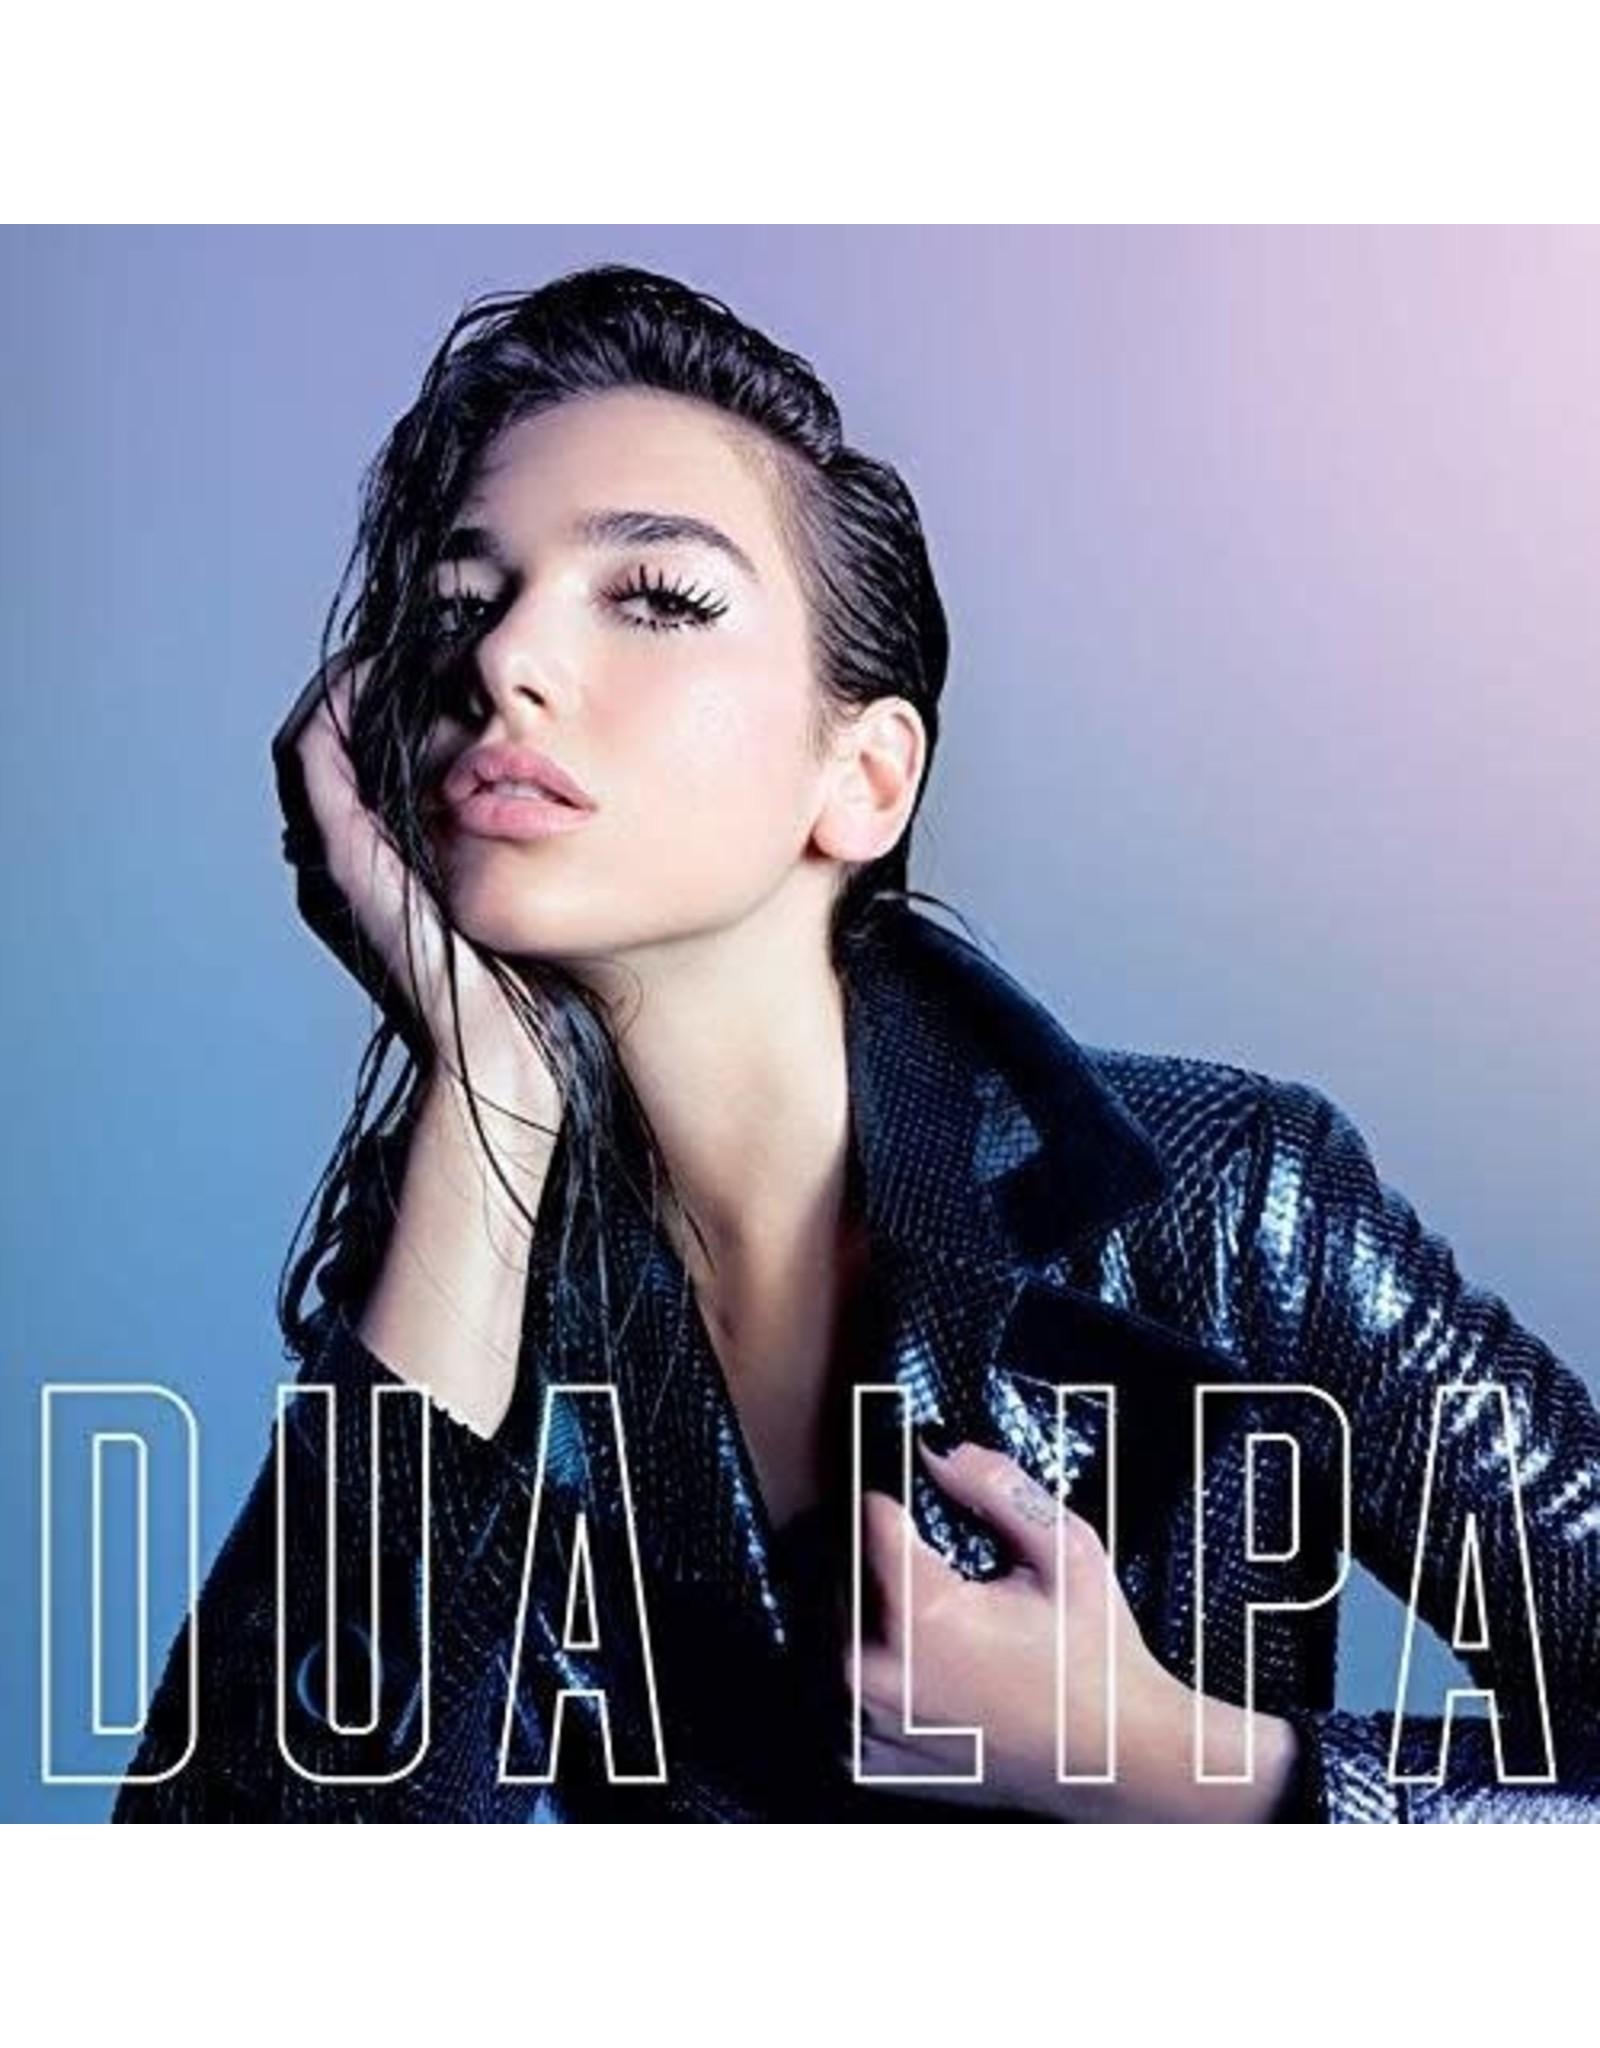 New Vinyl Dua Lipa - S/T LP